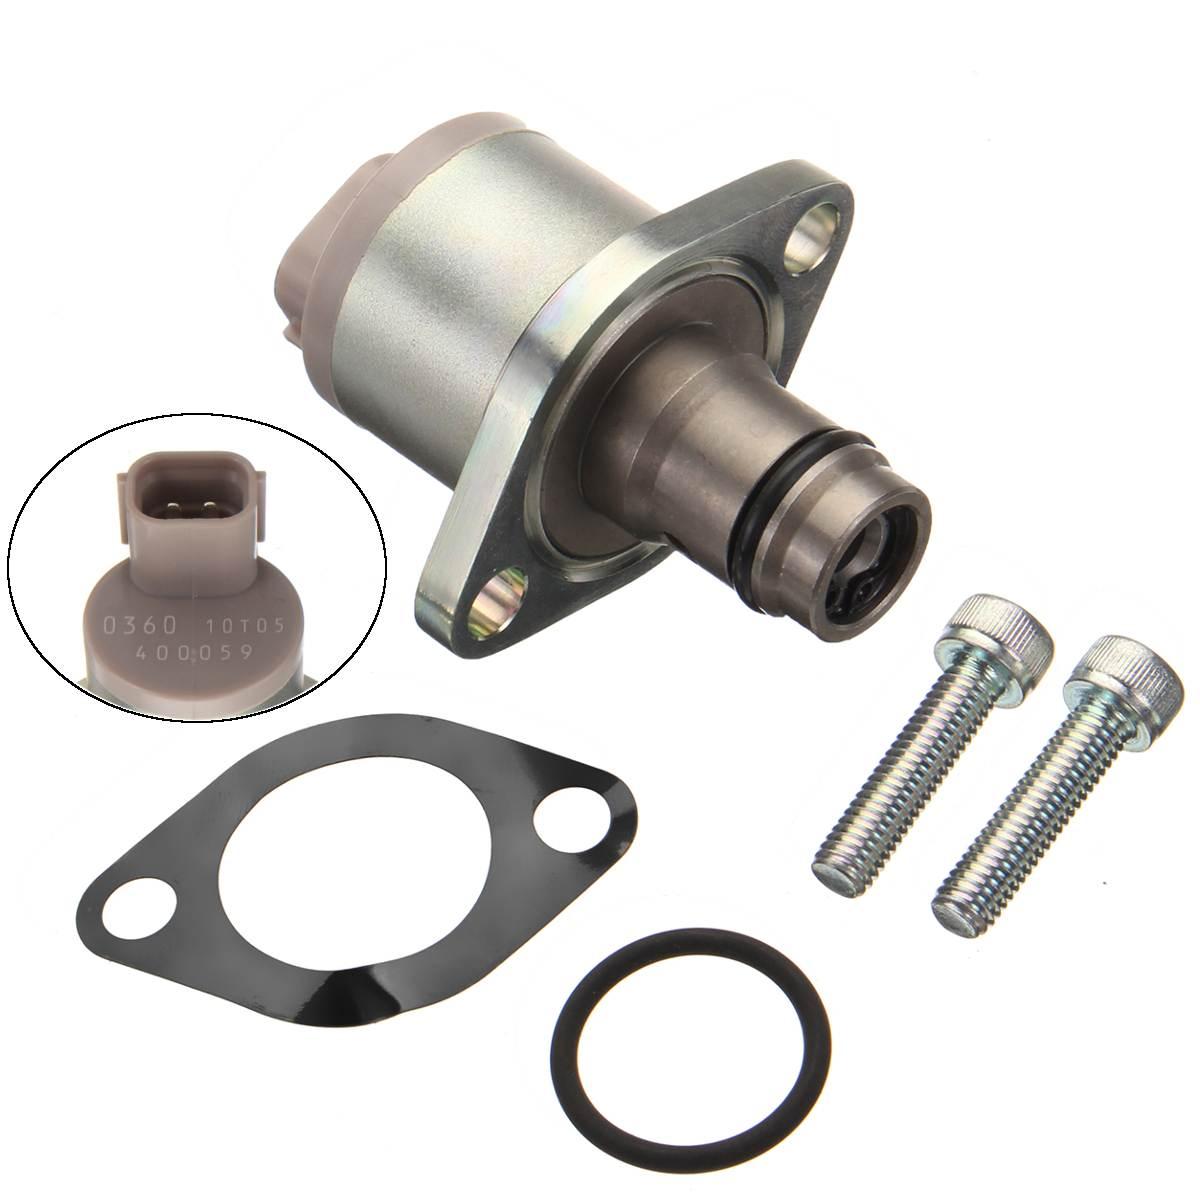 Car Fuel Injection Pump Pressure Regulator Suction Control Valve Air Control Valve For VAUXHALL OPEL MERIVA 1.7 CDTI 294200-036